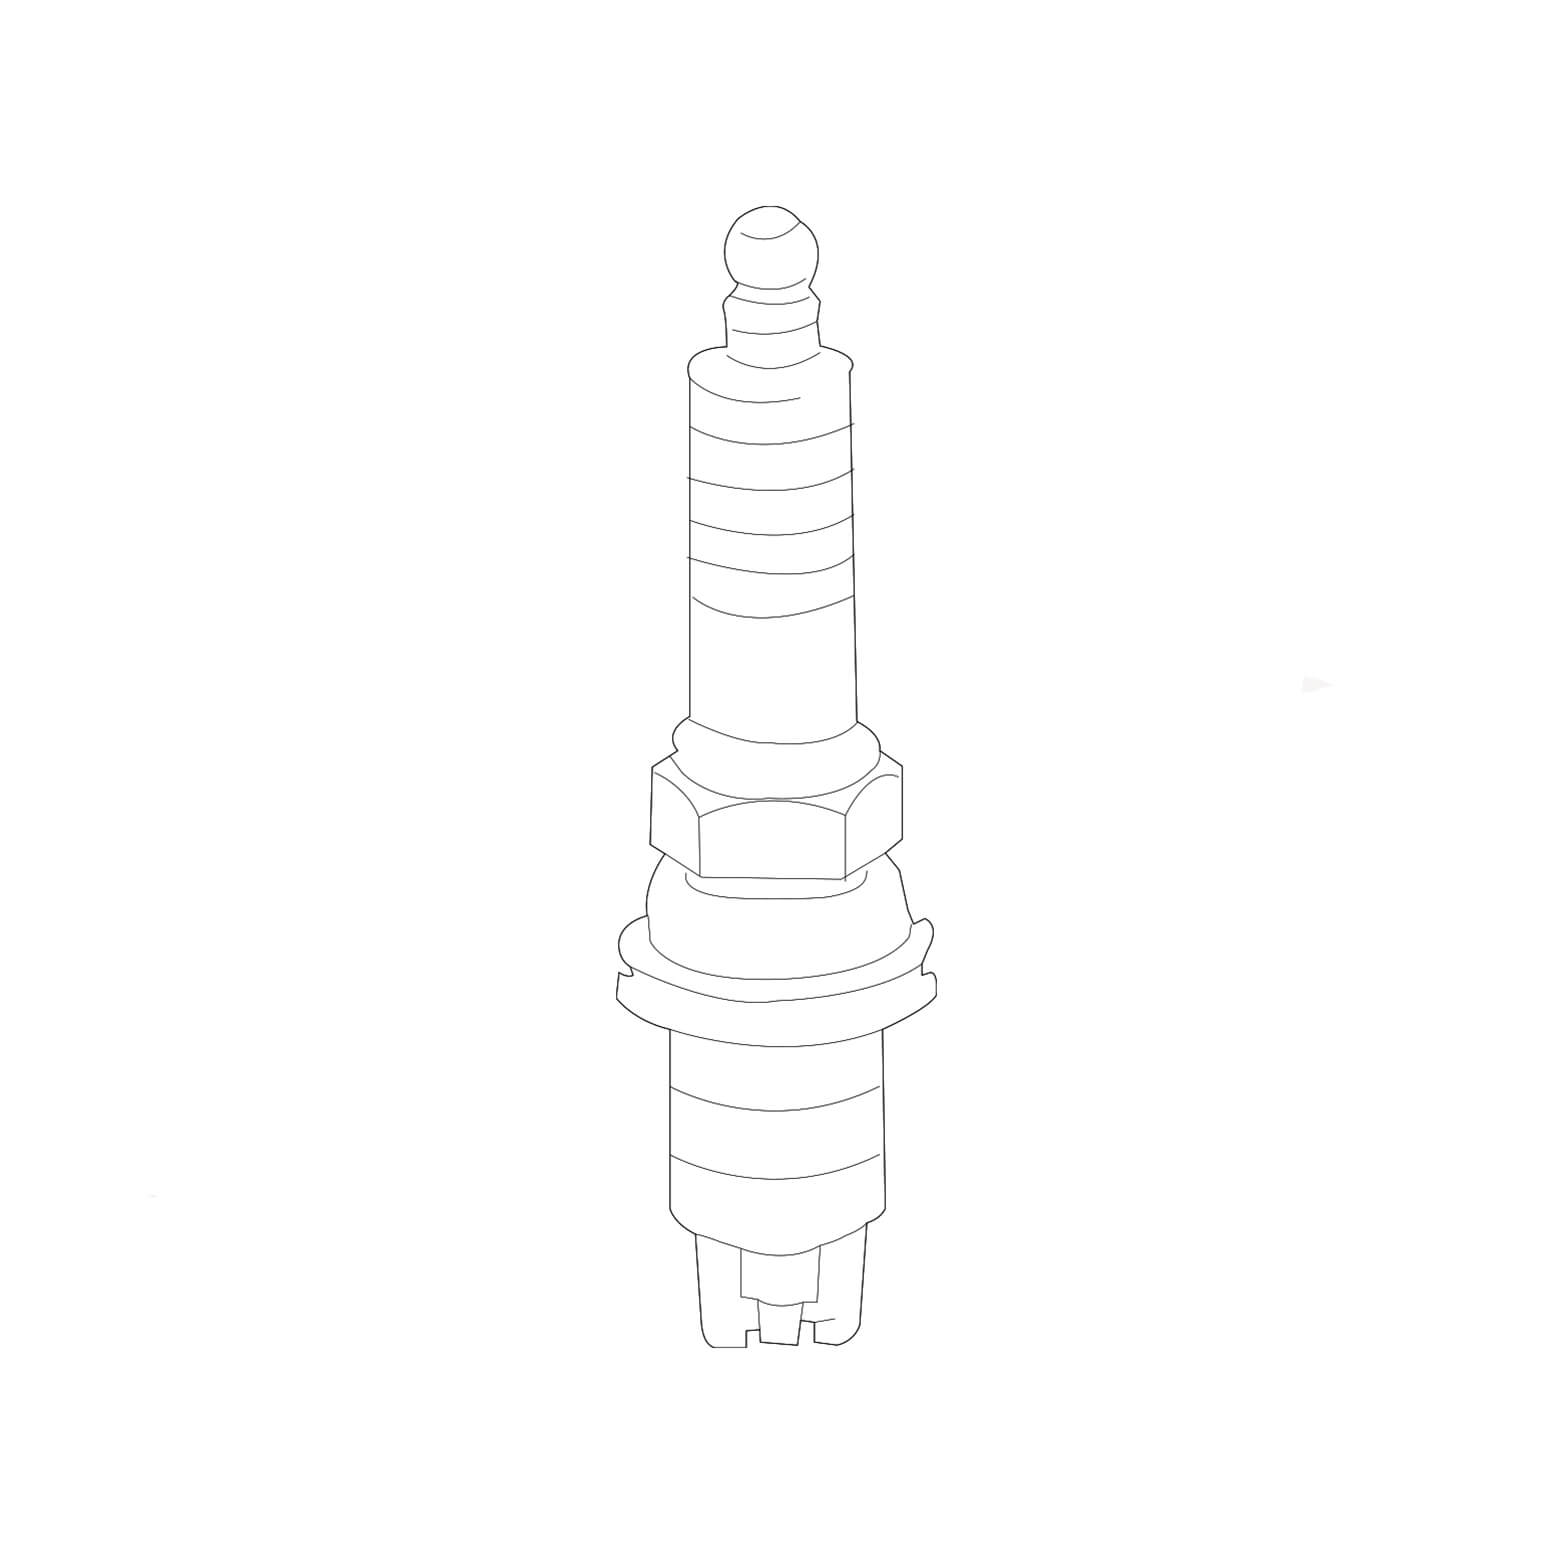 شمع موتور ایریدیوم ۱۱۱۶۰-۱۸۸۴۵